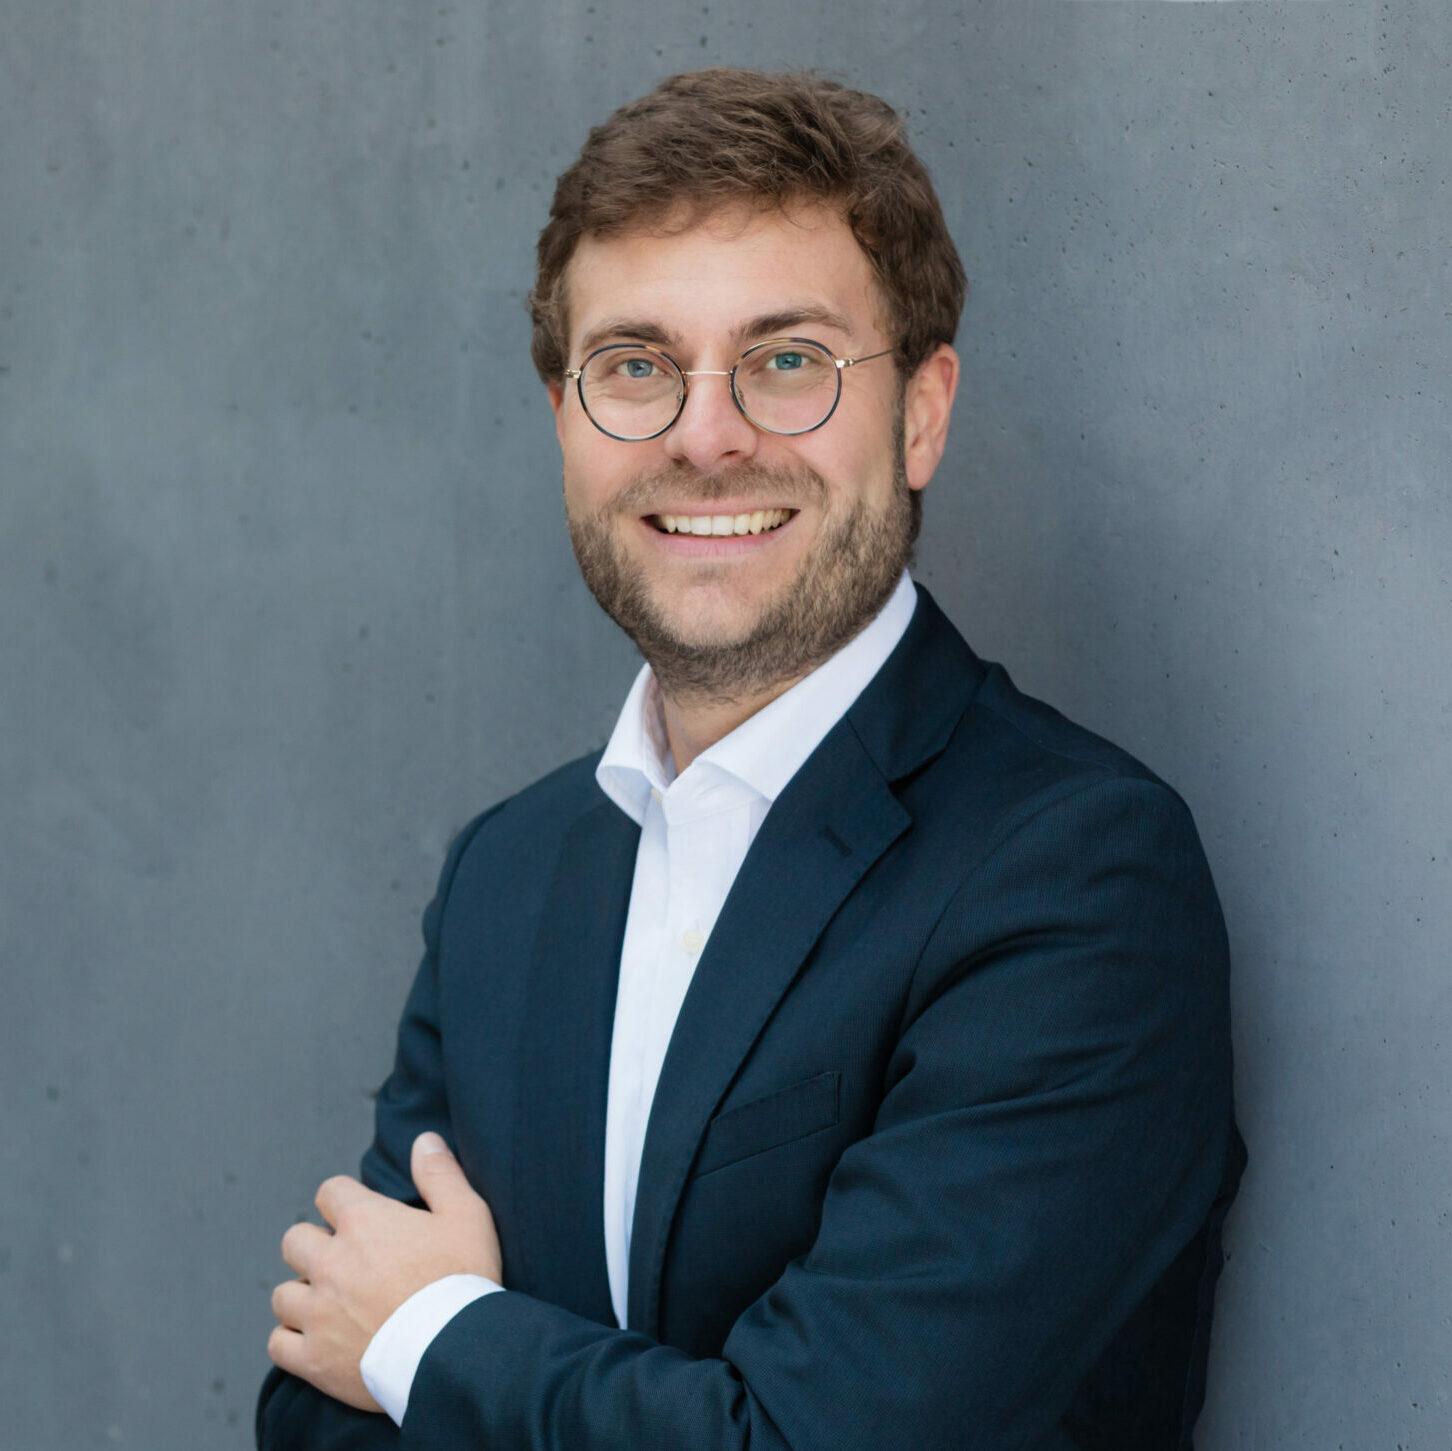 Christopher Buschow (Foto: Matthias Eckert)